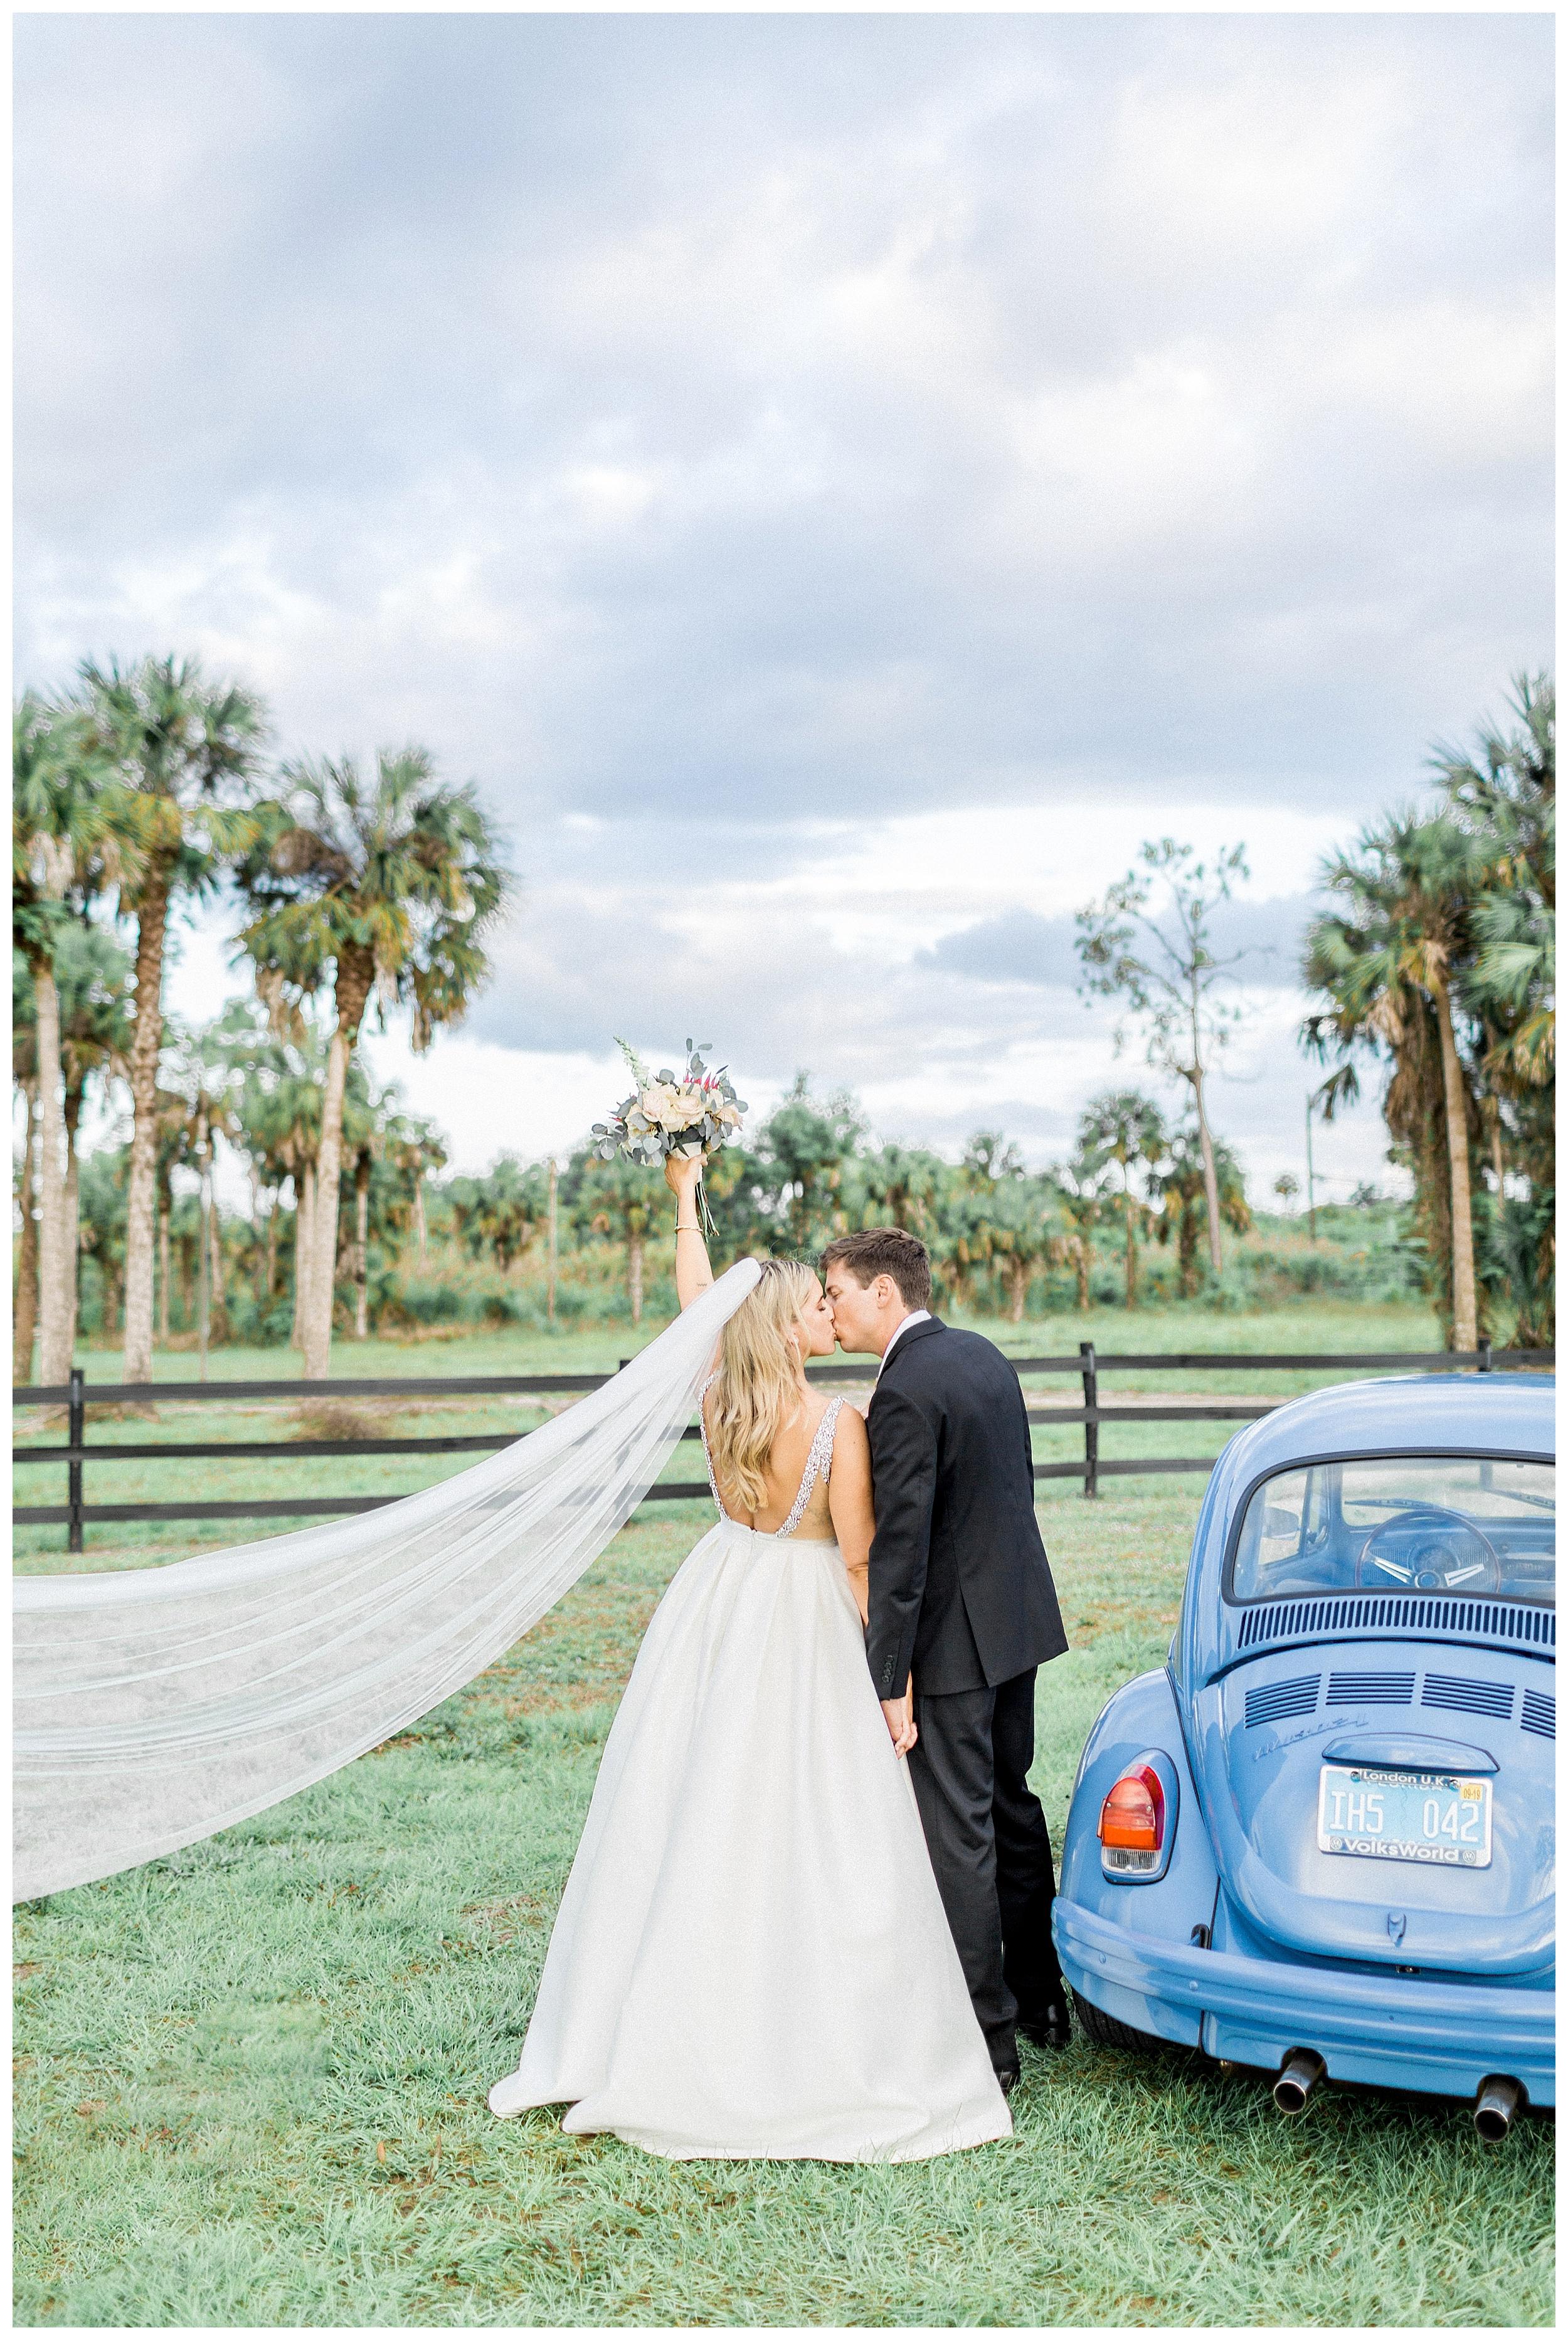 South Florida Wedding Photographer Kir Tuben_0095.jpg